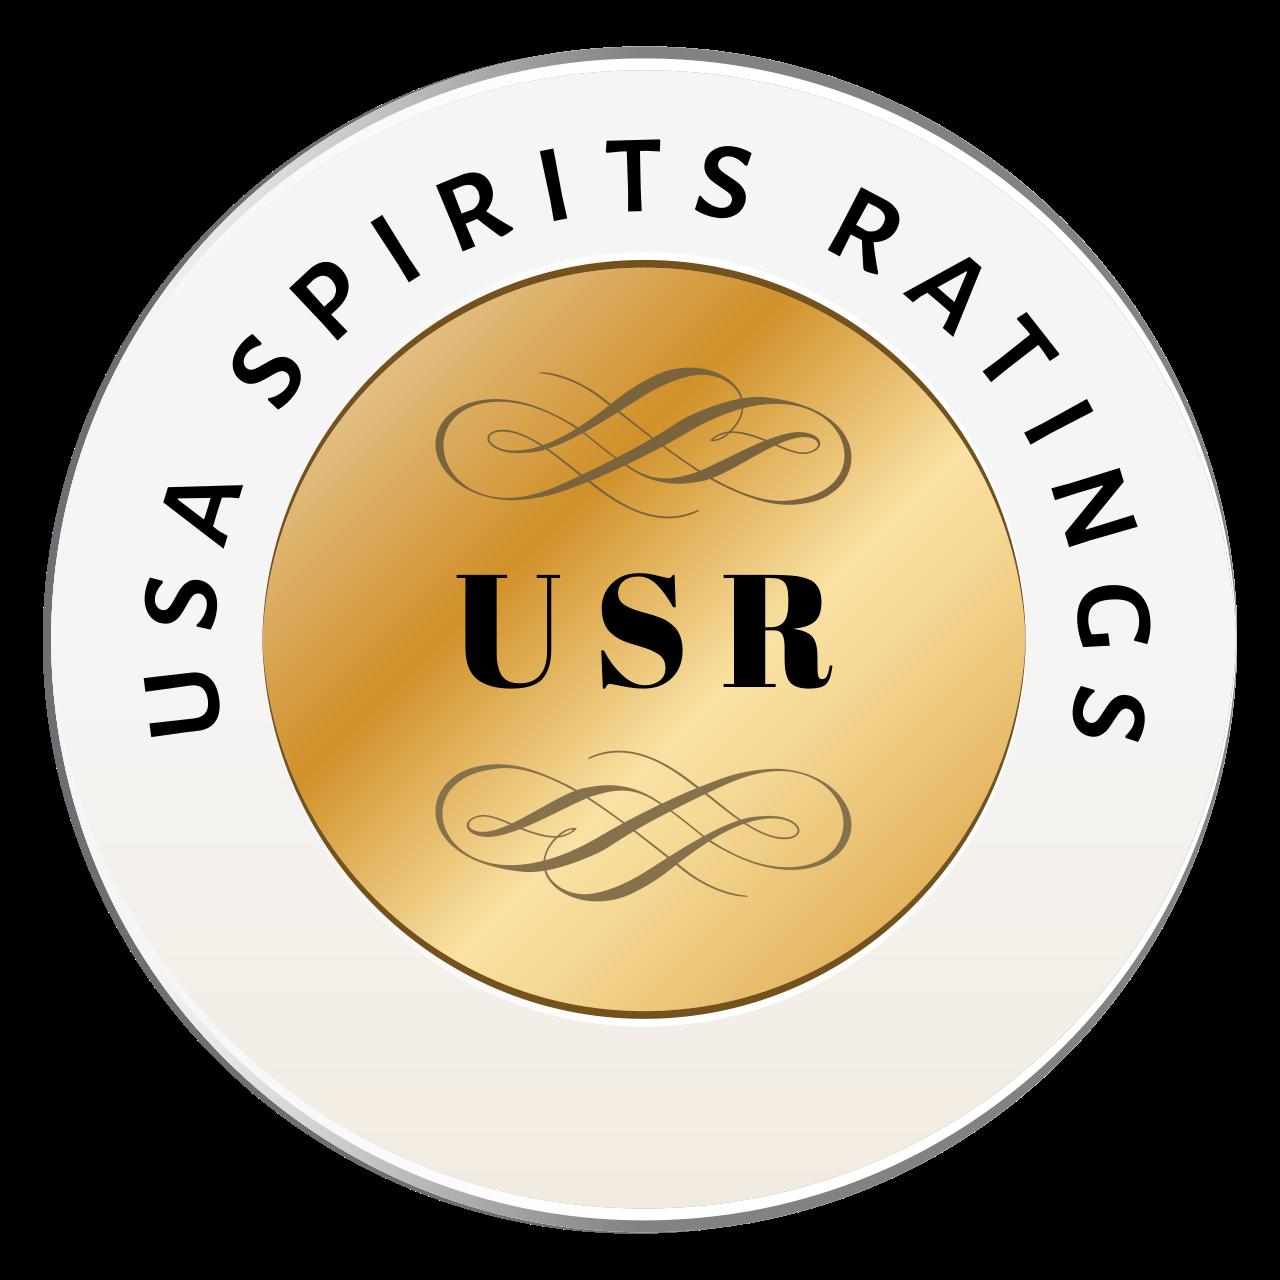 USA Spirits Ratings Gold Medal